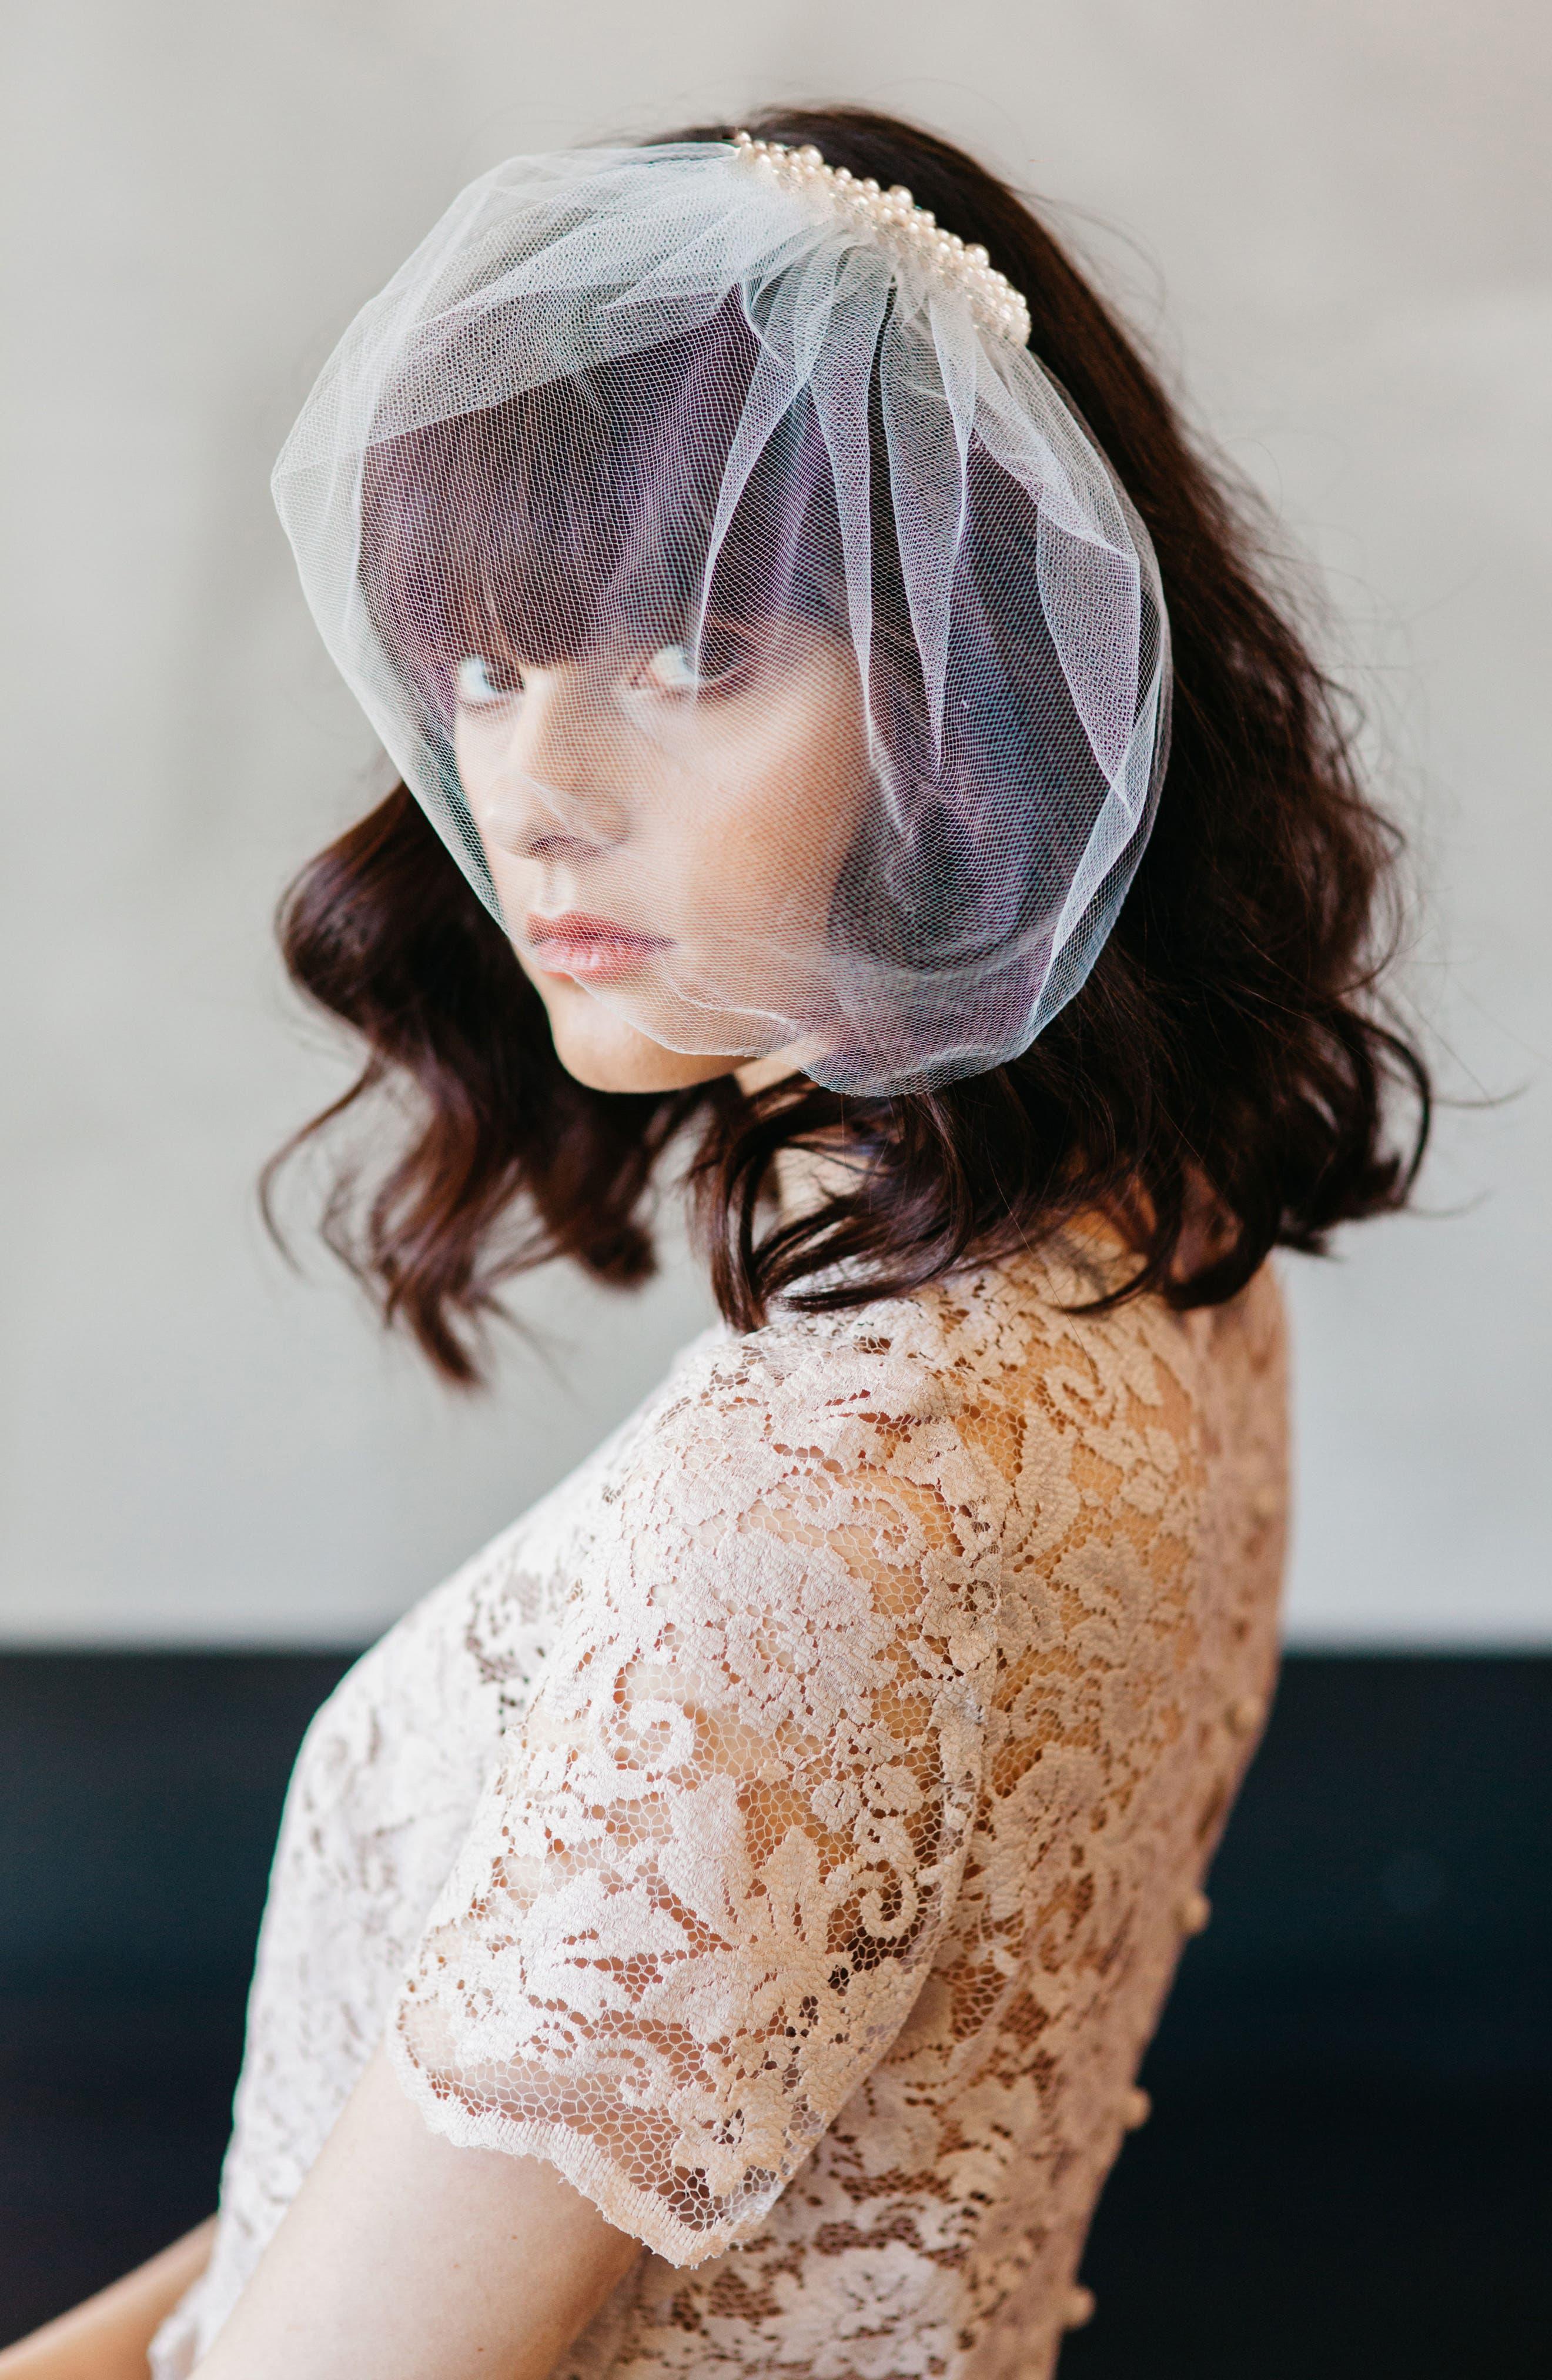 Main Image - J-Picone Bridal Veil Hair Comb